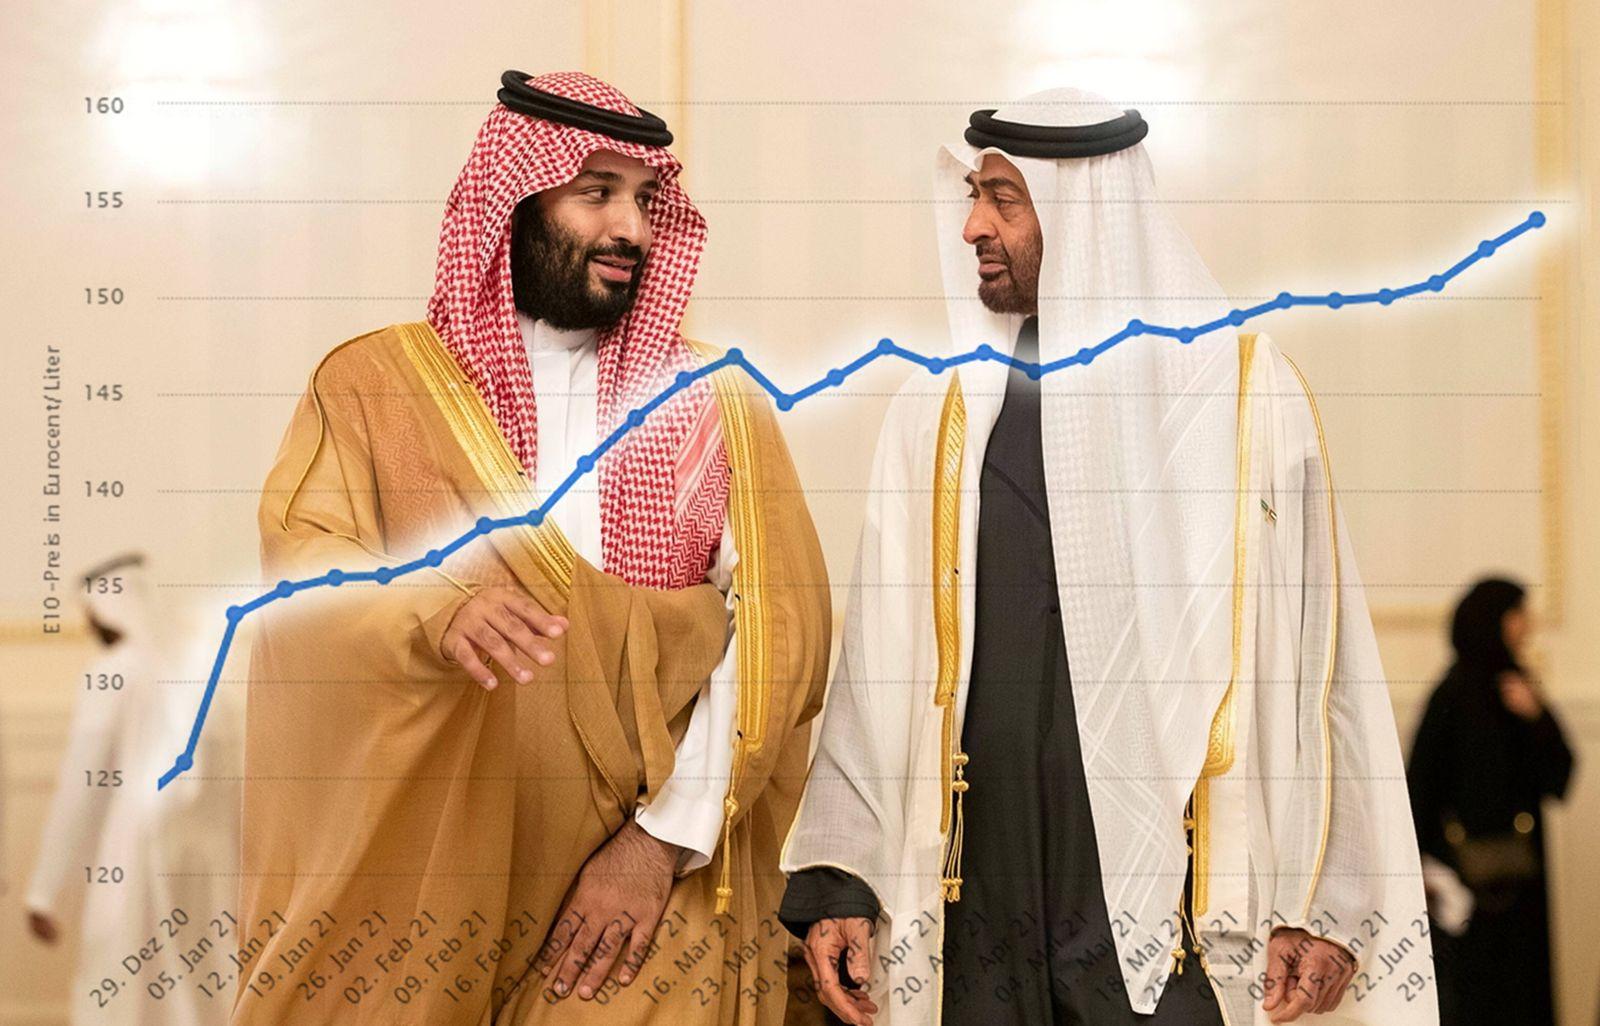 181123 ABU DHABI Nov 23 2018 Sheikh Mohamed bin Zayed Al Nahyan R crown prince of Abu